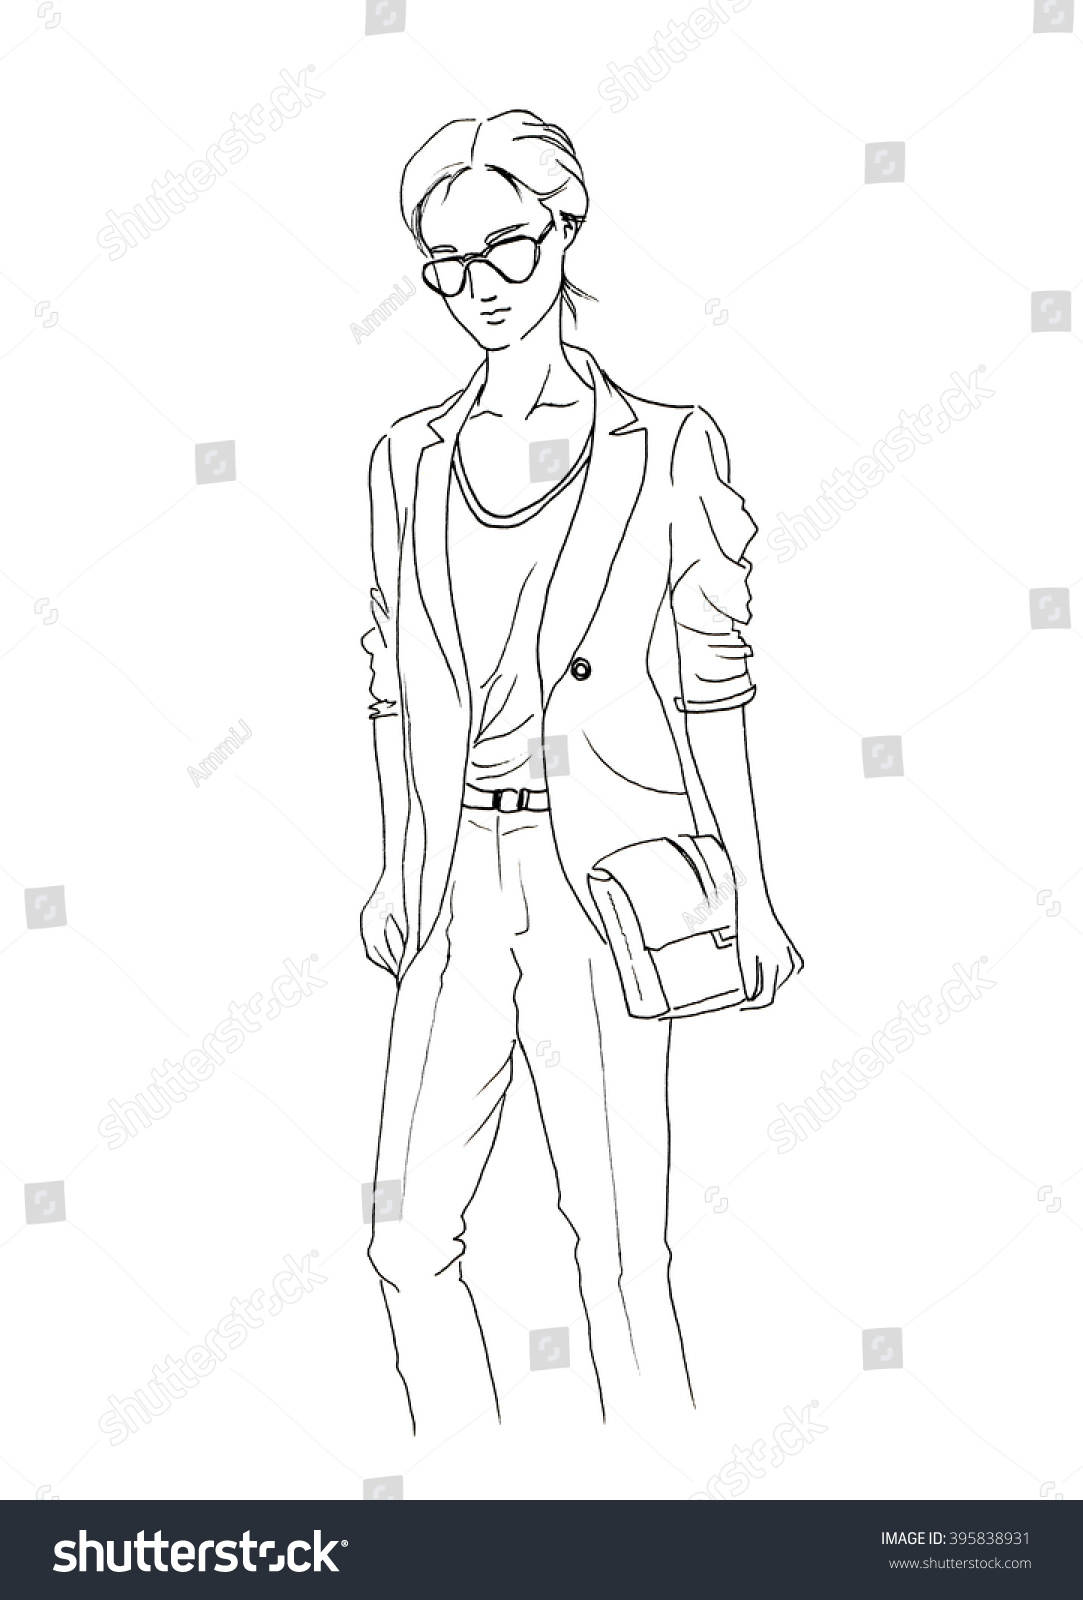 Line Drawing Jacket : Women wear glass holding bag jacket stock illustration